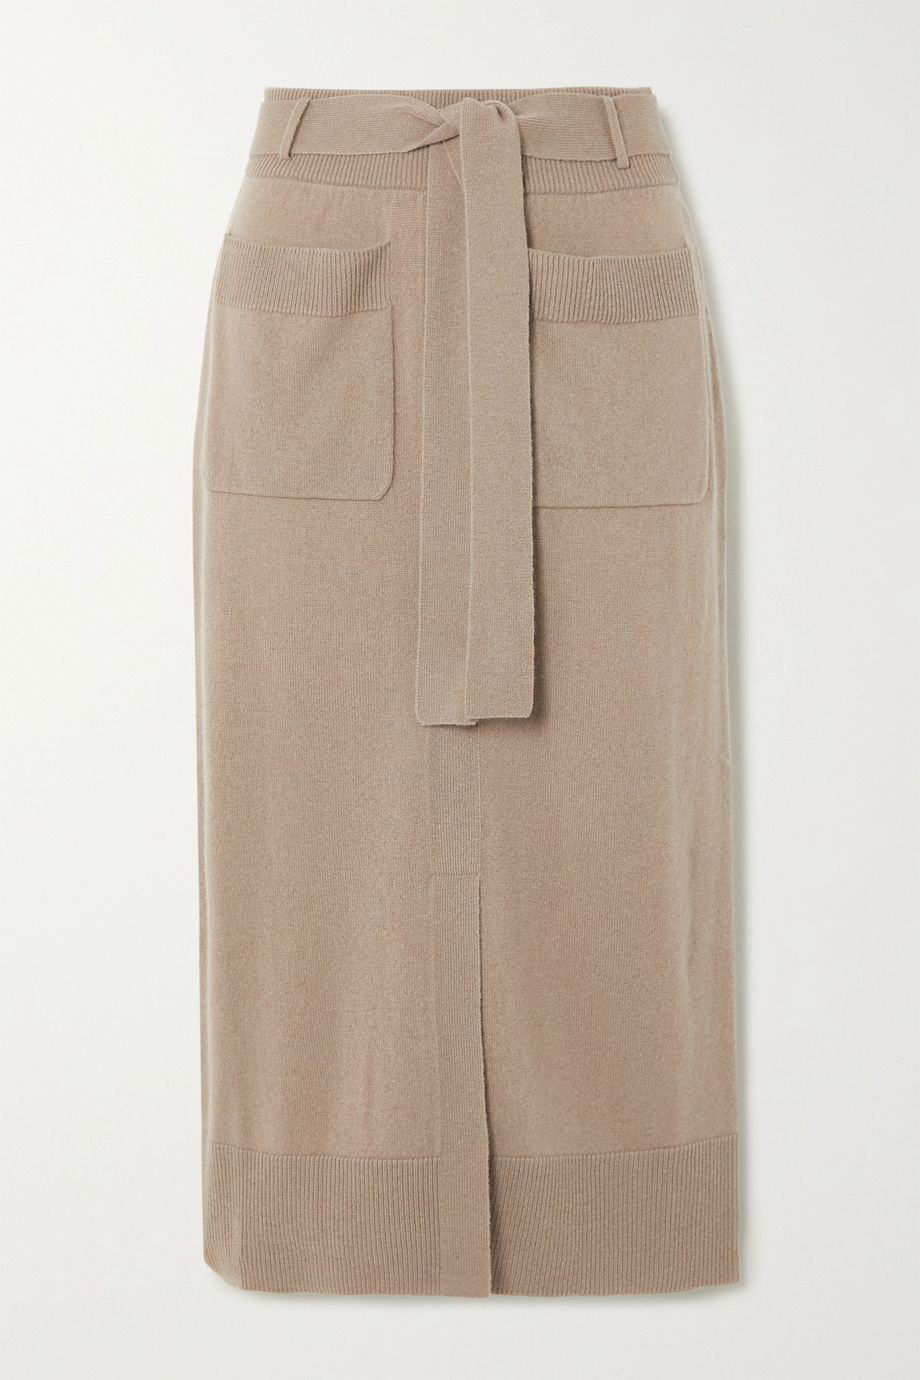 Agnona Belted cashmere-blend midi skirt